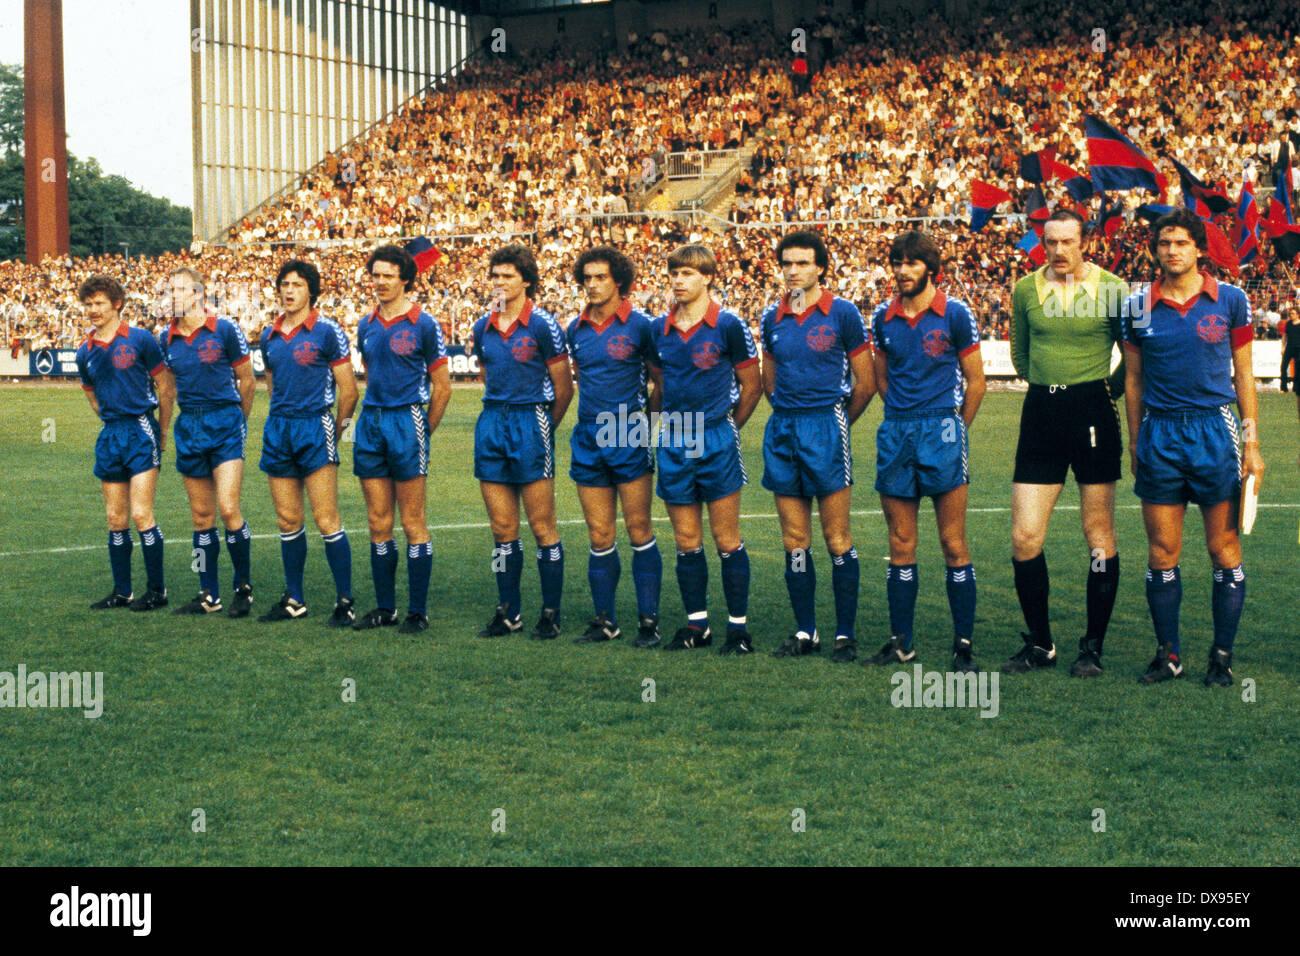 football, 2. Bundesliga Nord, 2. Bundesliga Sued, 1978/1979, relegation match to Bundesliga 1979/1980, return leg, Grotenburg Stadium in Krefeld, FC Bayer 05 Uerdingen versus SpVgg Bayreuth 2:1, team shot Bayer, f.l.t.r. Ludwig Lurz, Jens Steffensen, Fran - Stock Image